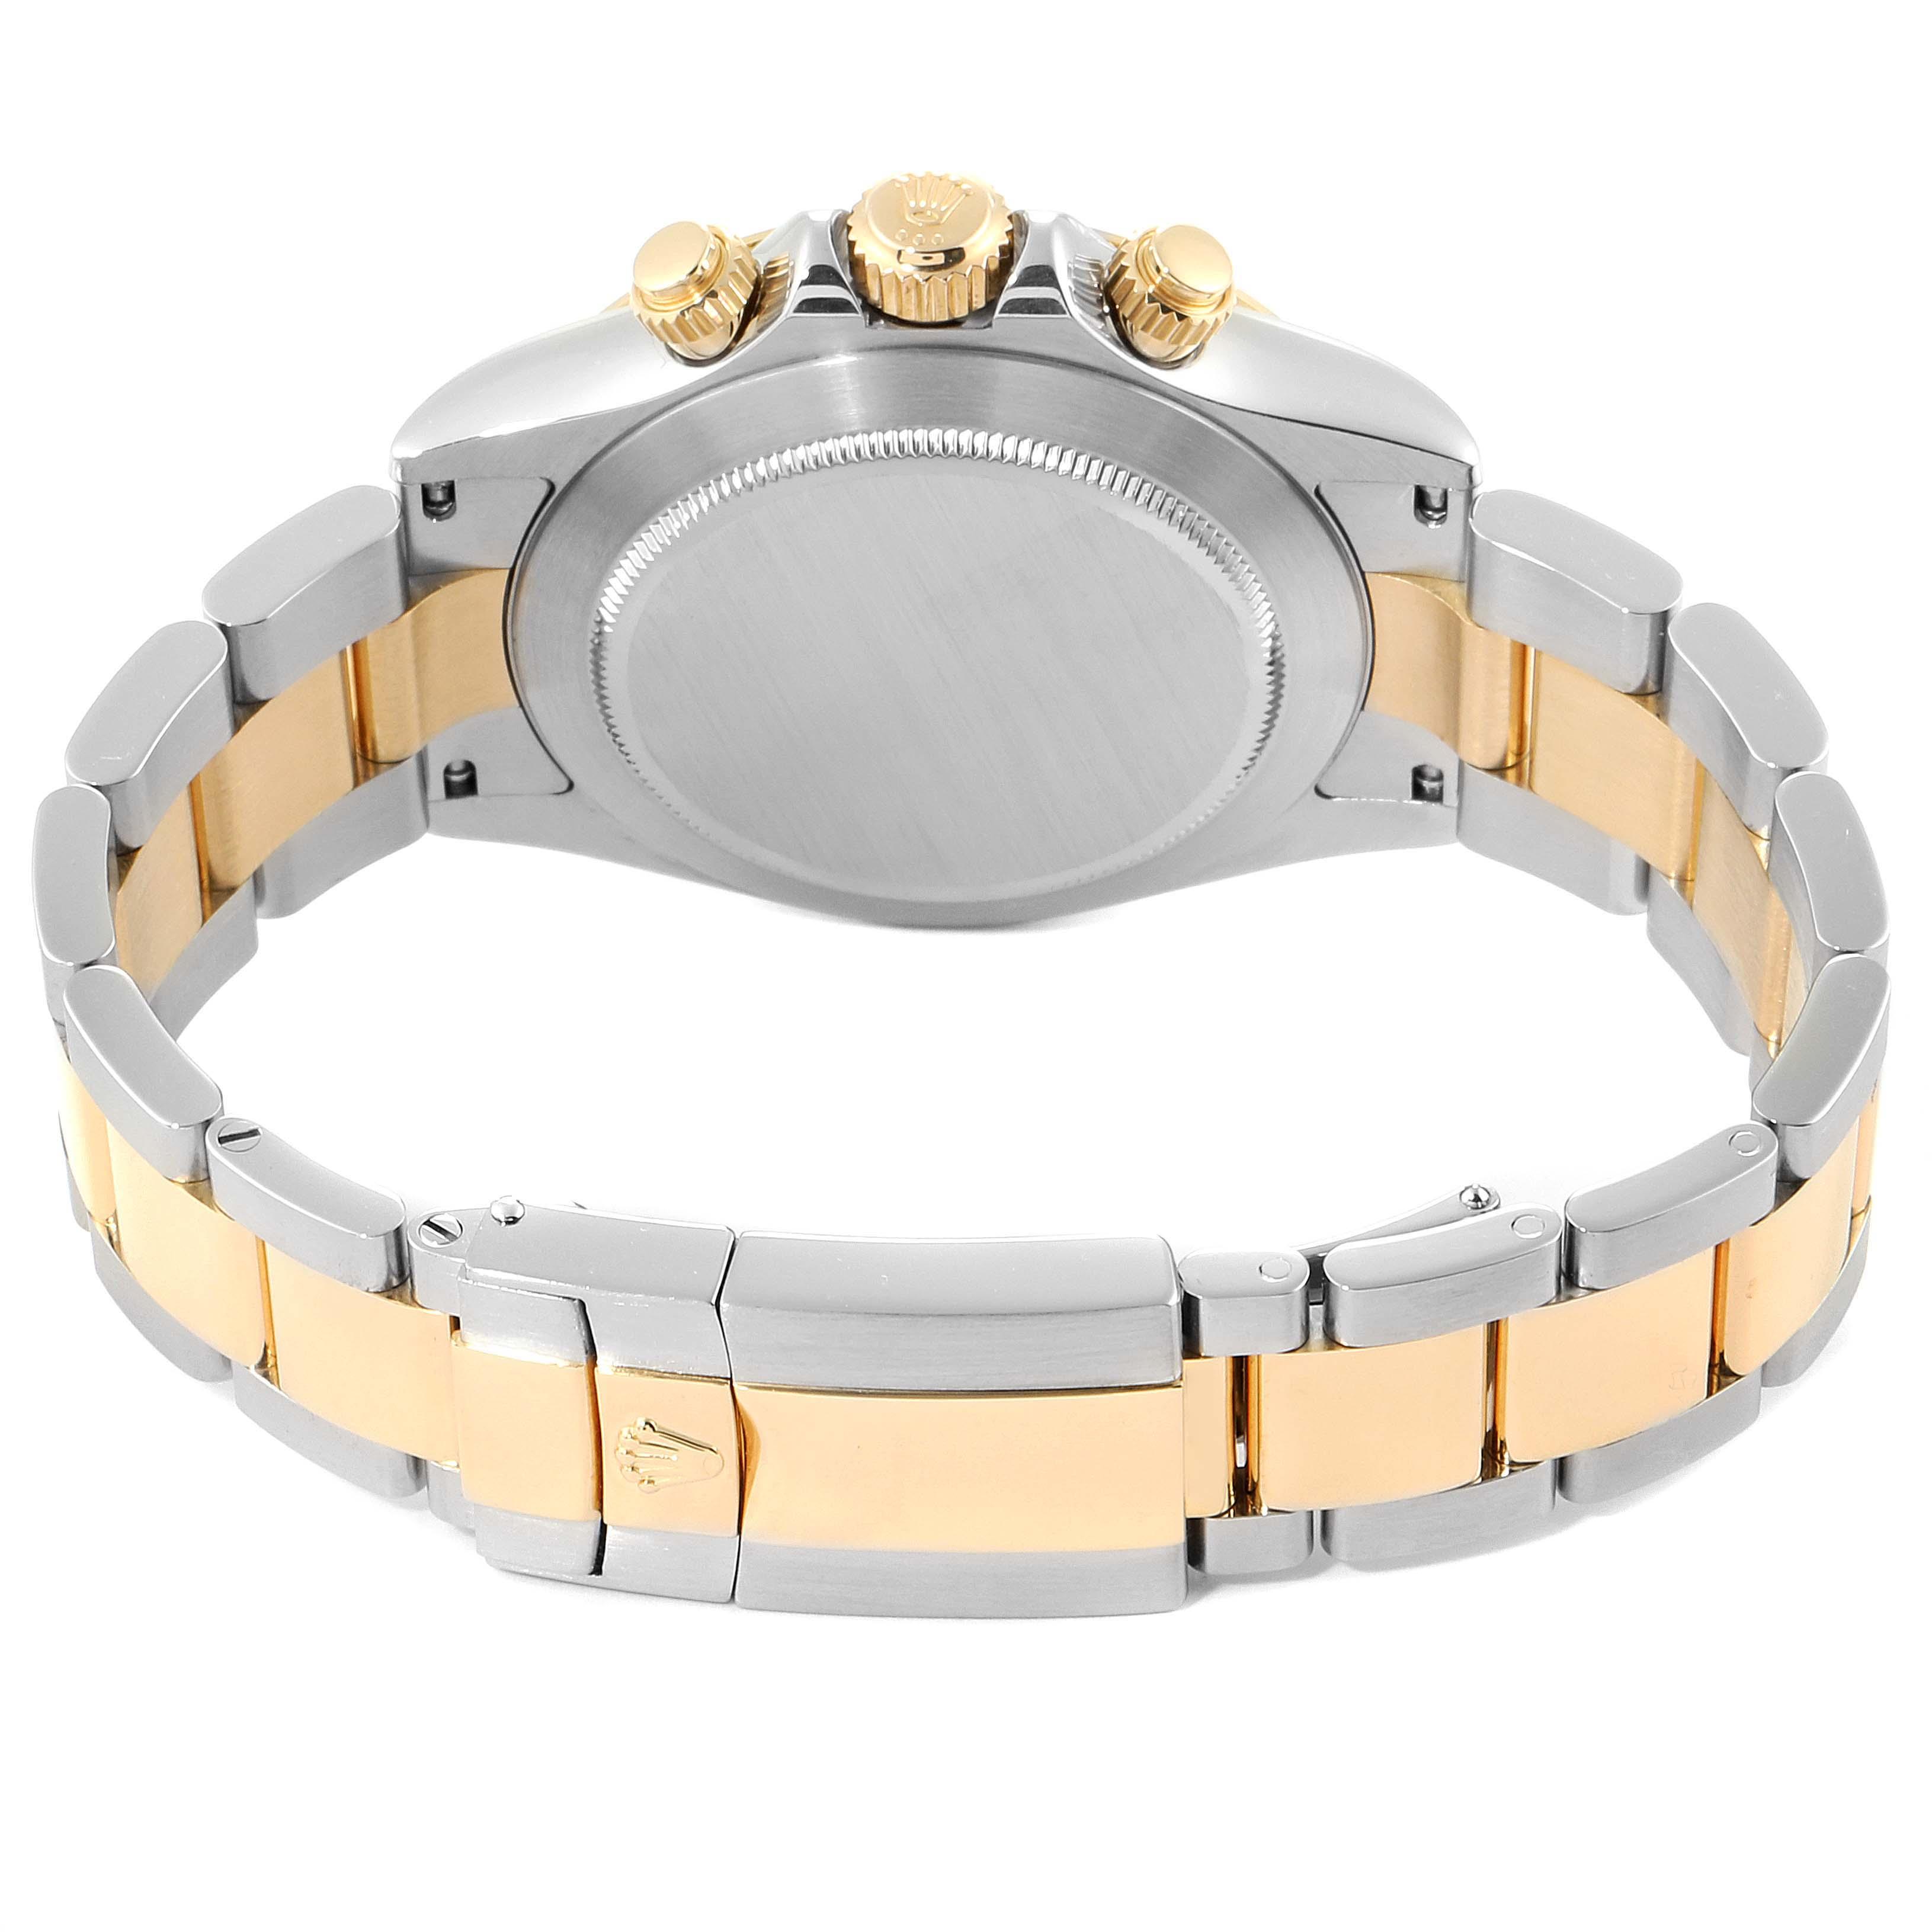 Rolex Daytona Steel Yellow Gold Slate Dial Mens Watch 116523 Box SwissWatchExpo